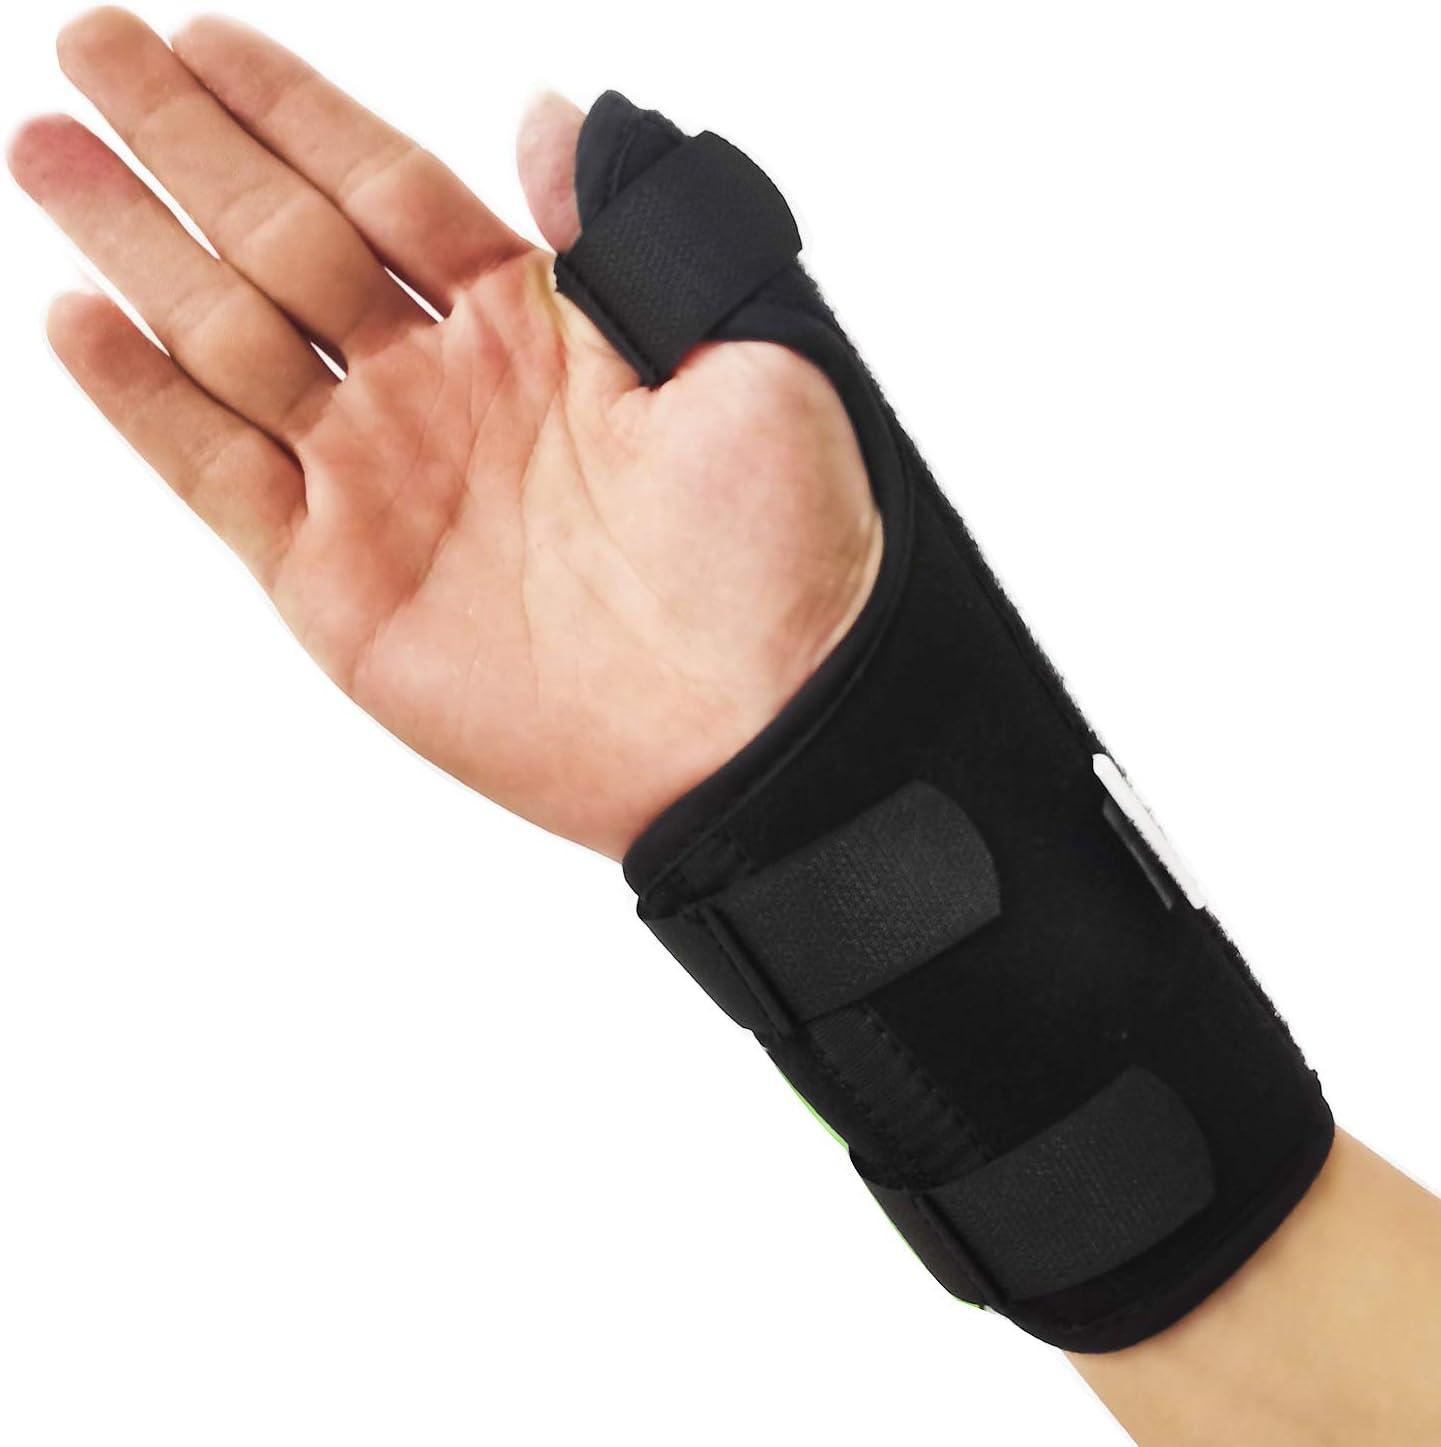 TODDOBRA Thumb Spica Splint- Brace Oklahoma City Mall T for Arthritis Soft or Washington Mall